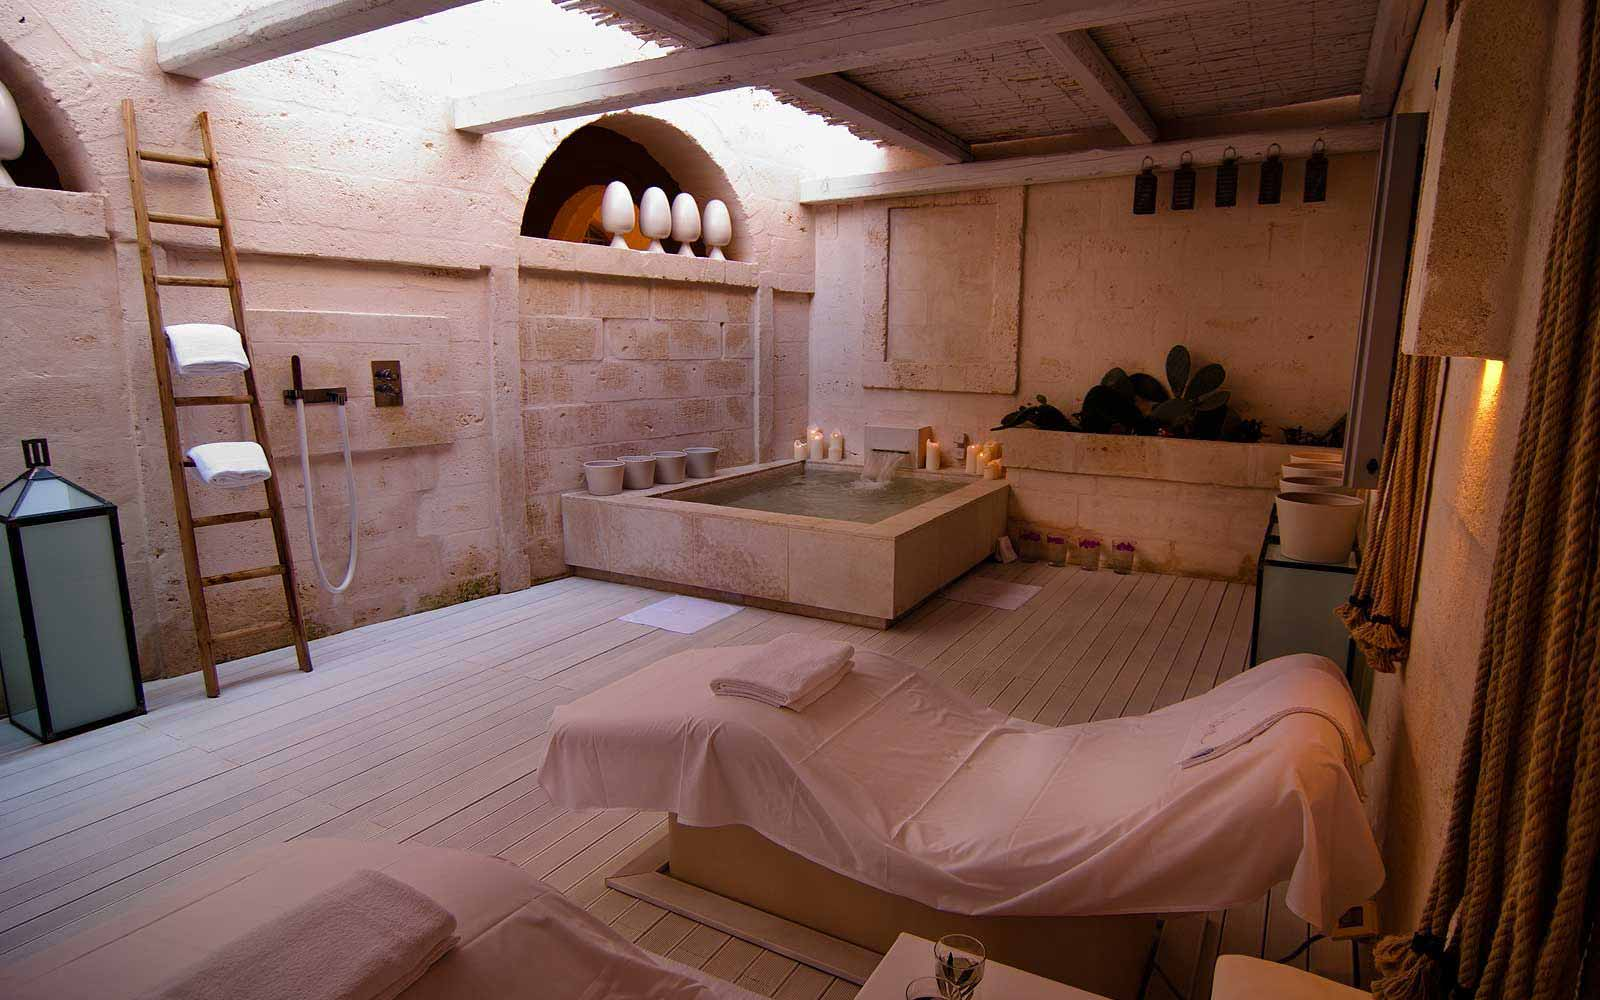 Vair Spa at the Borgo Egnazia